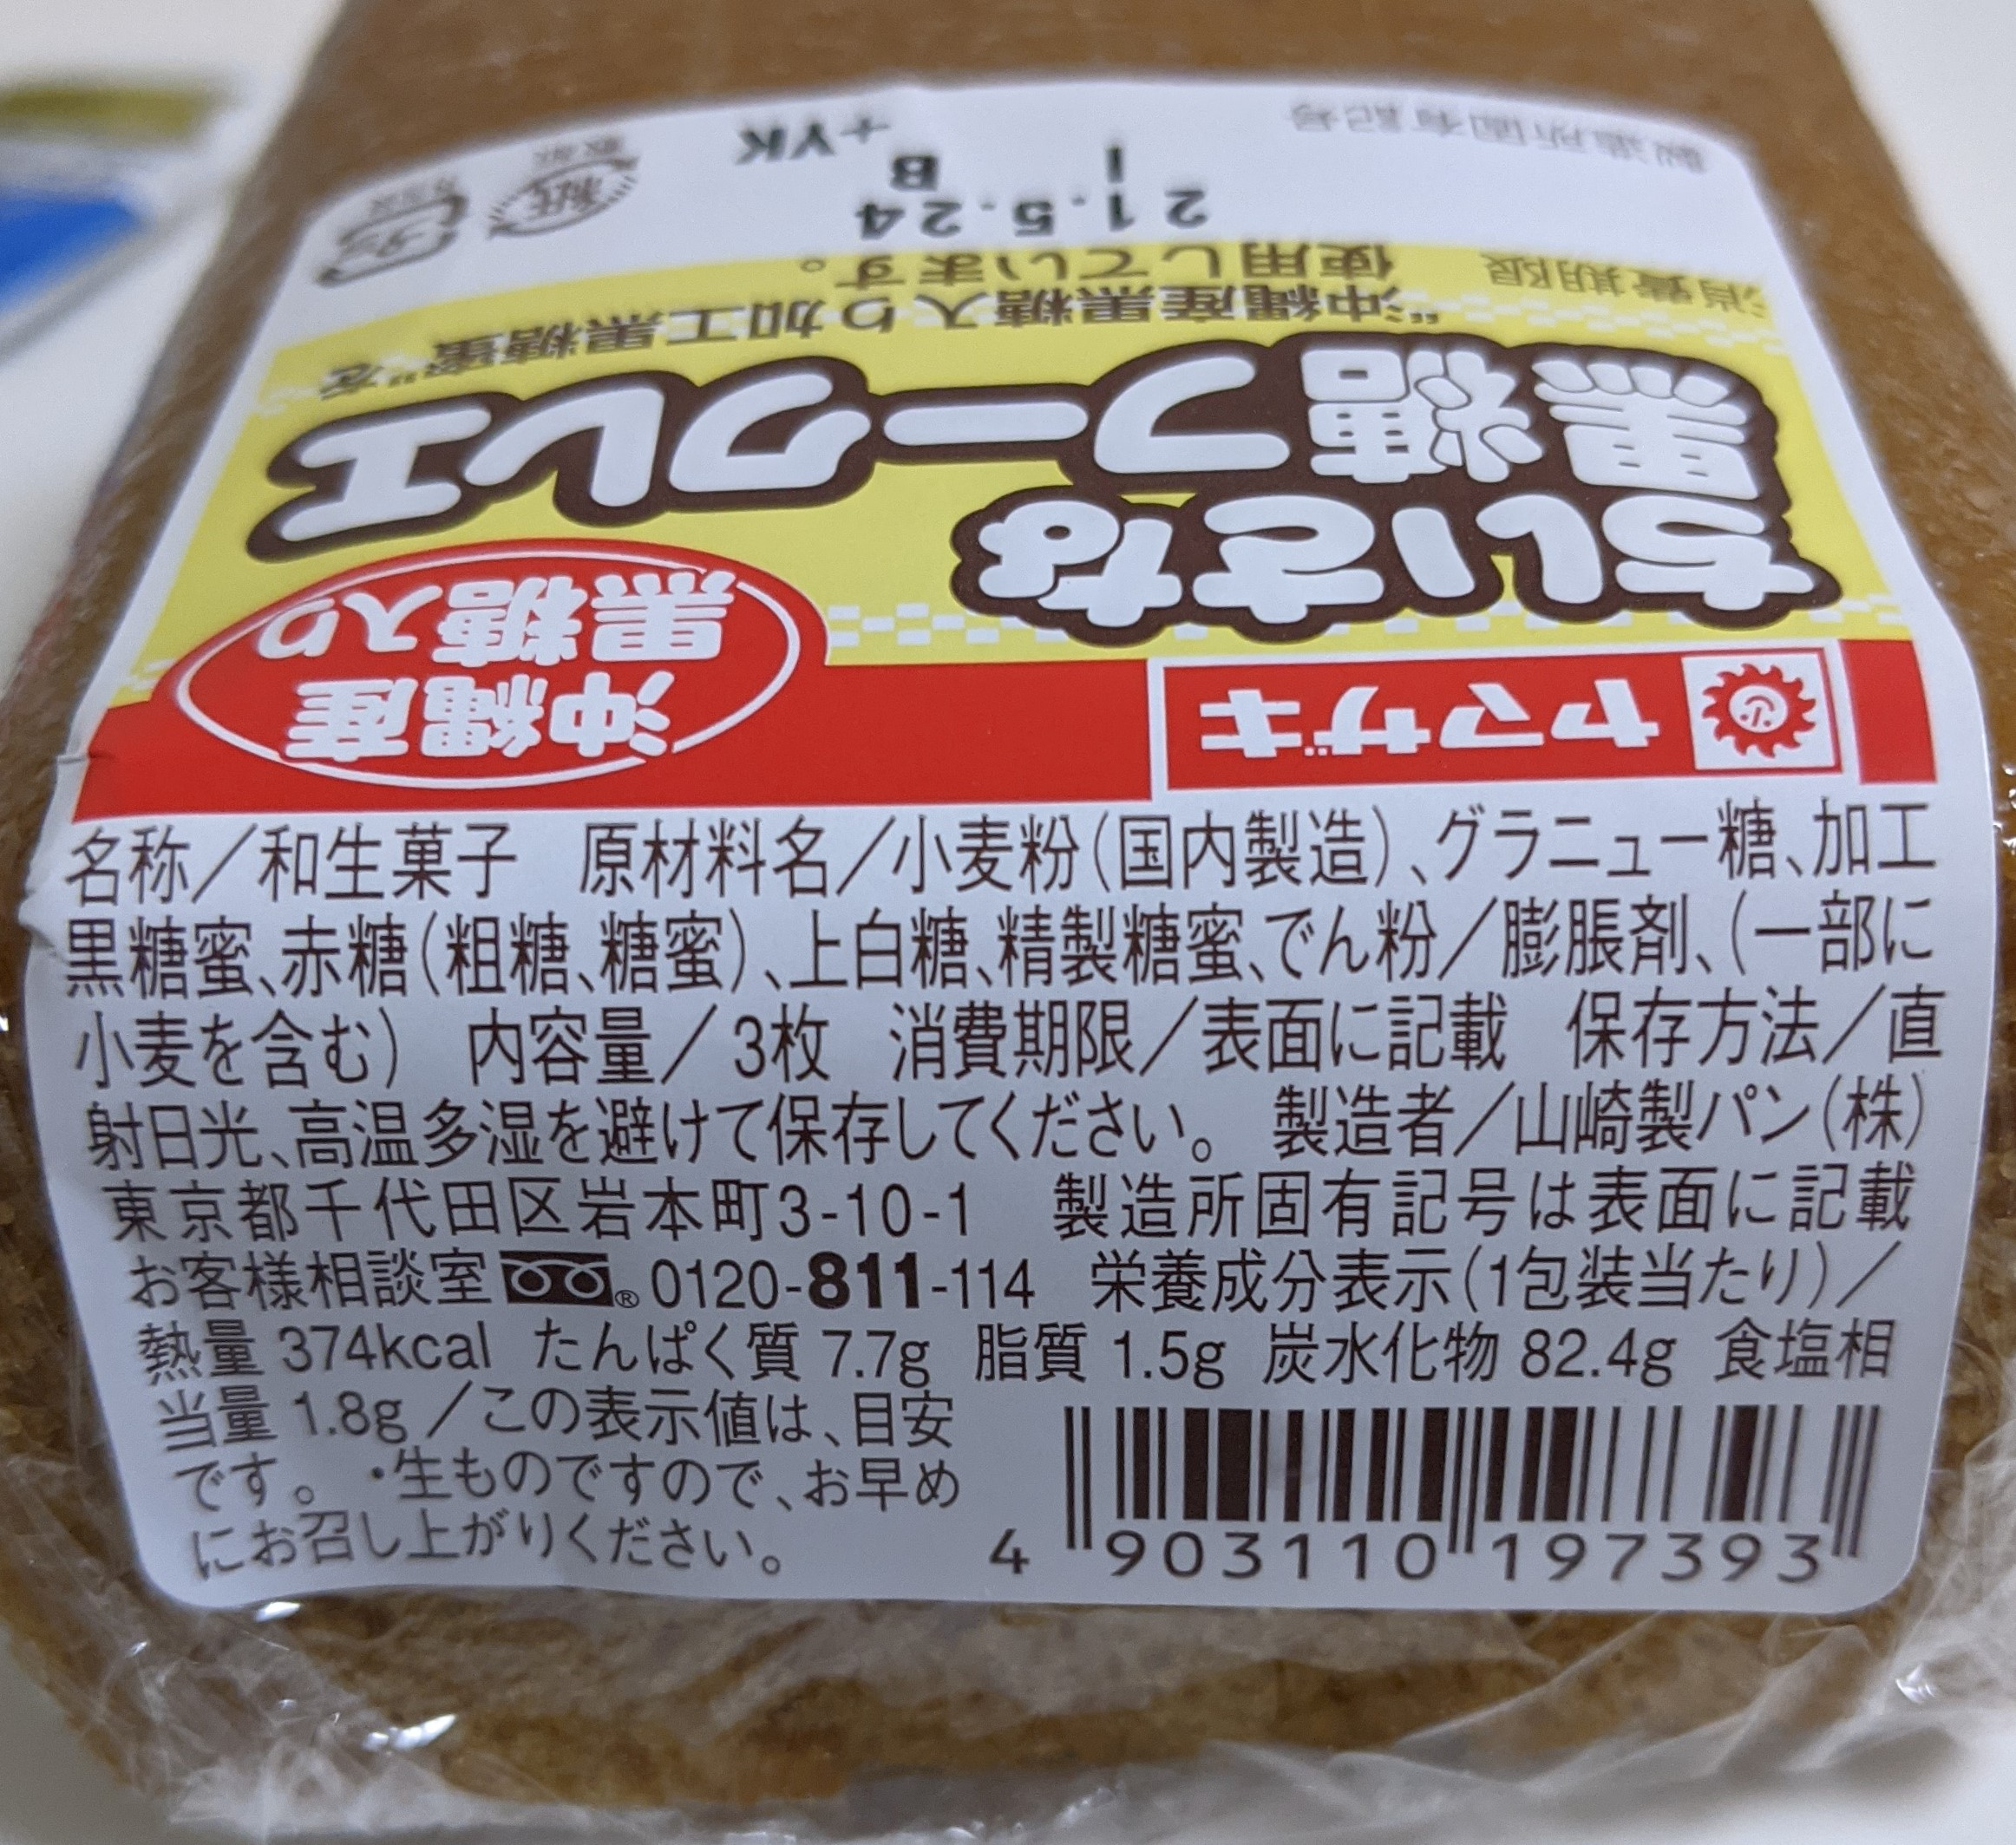 Yamazaki Small Kokuto Fukuree ingredient panel